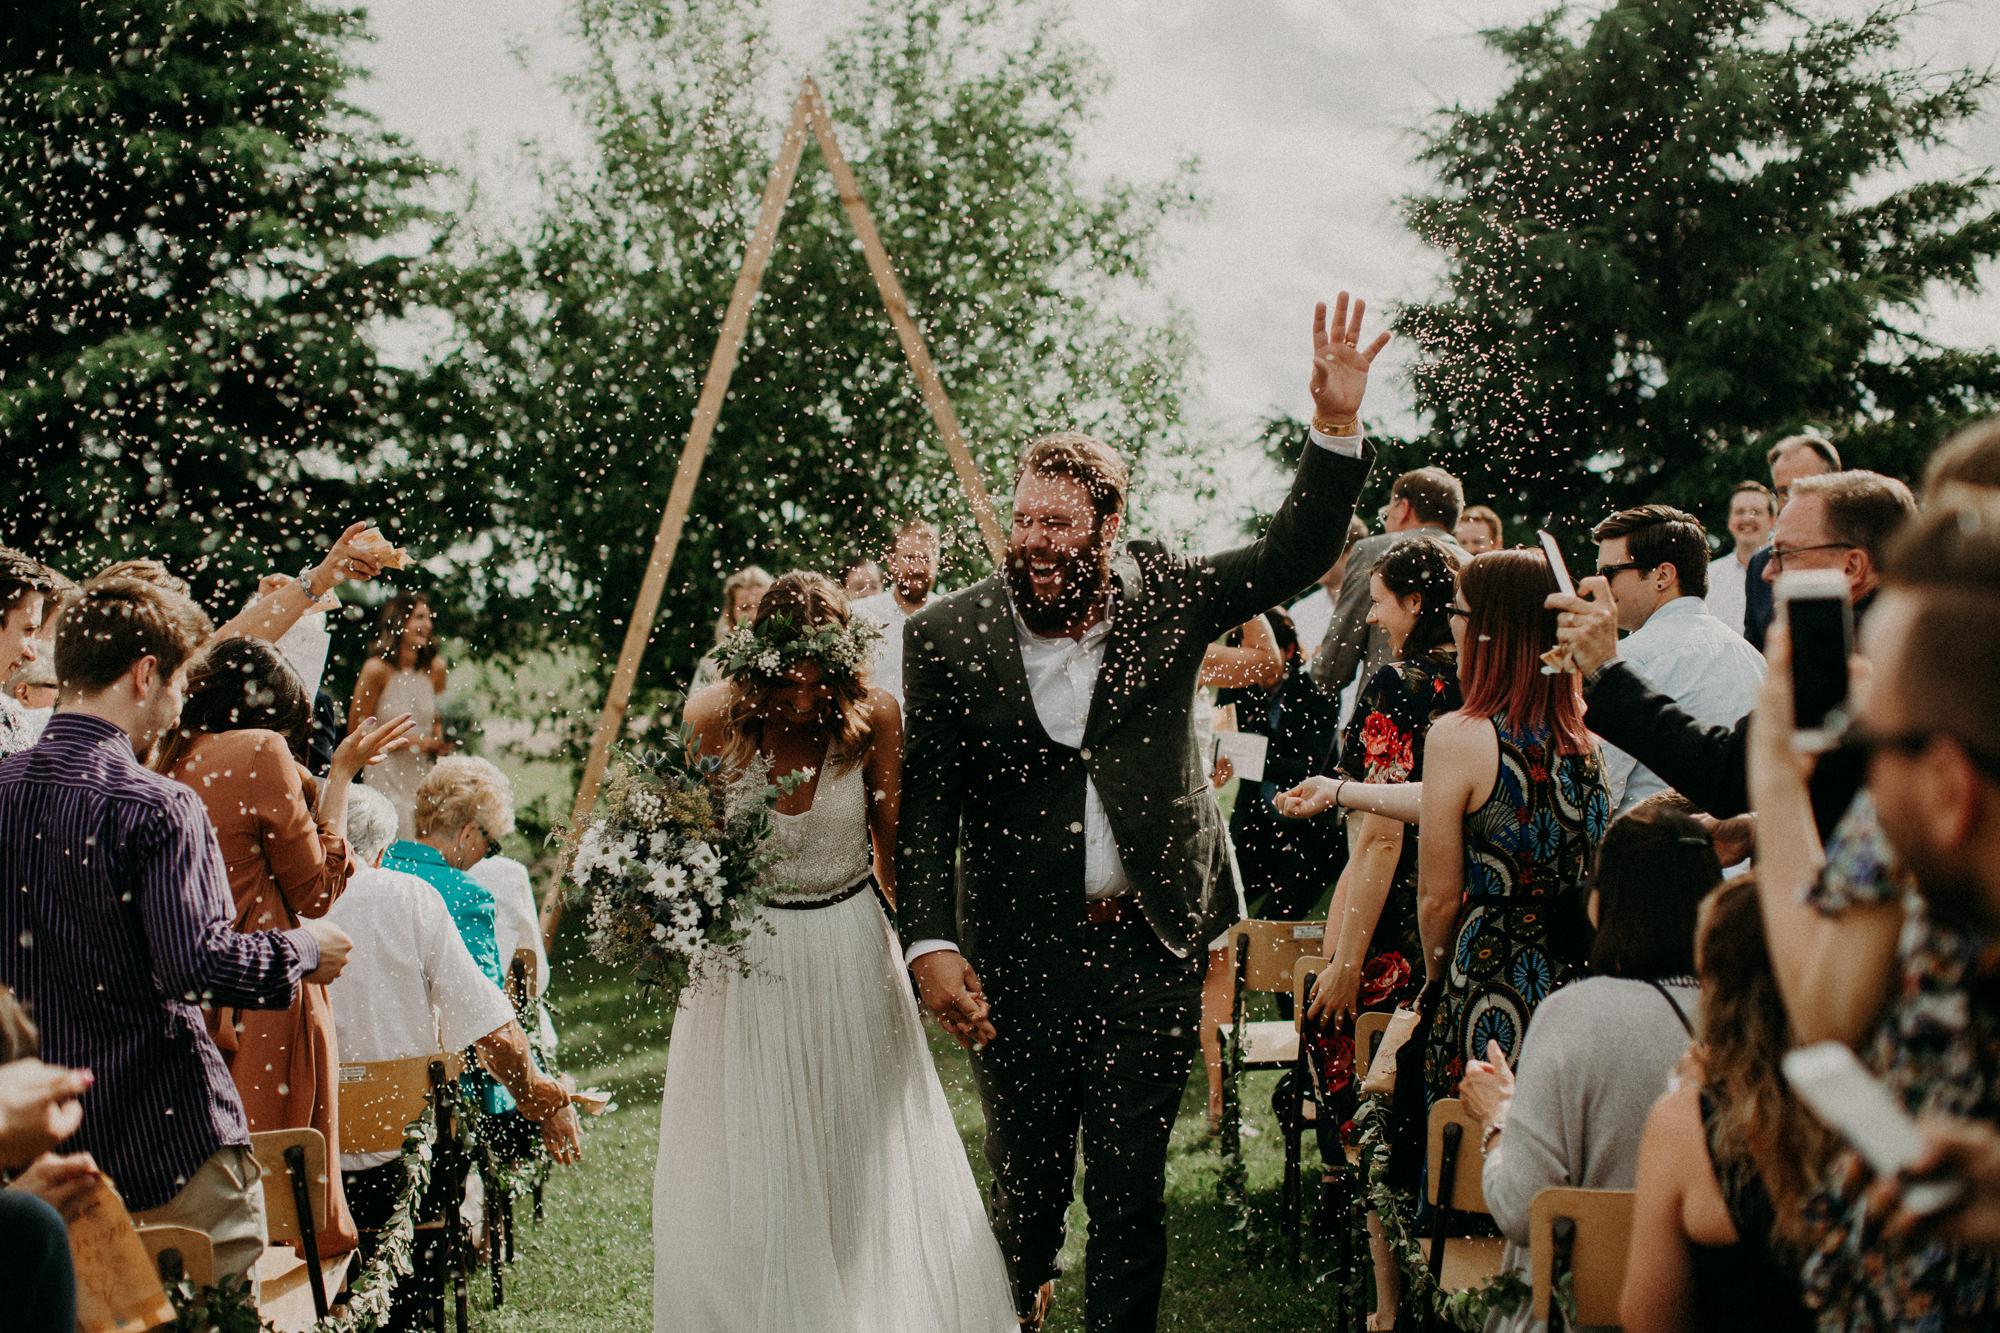 Vancouver-Wedding-Photographer-Candice-Marie-Photography-10.jpg